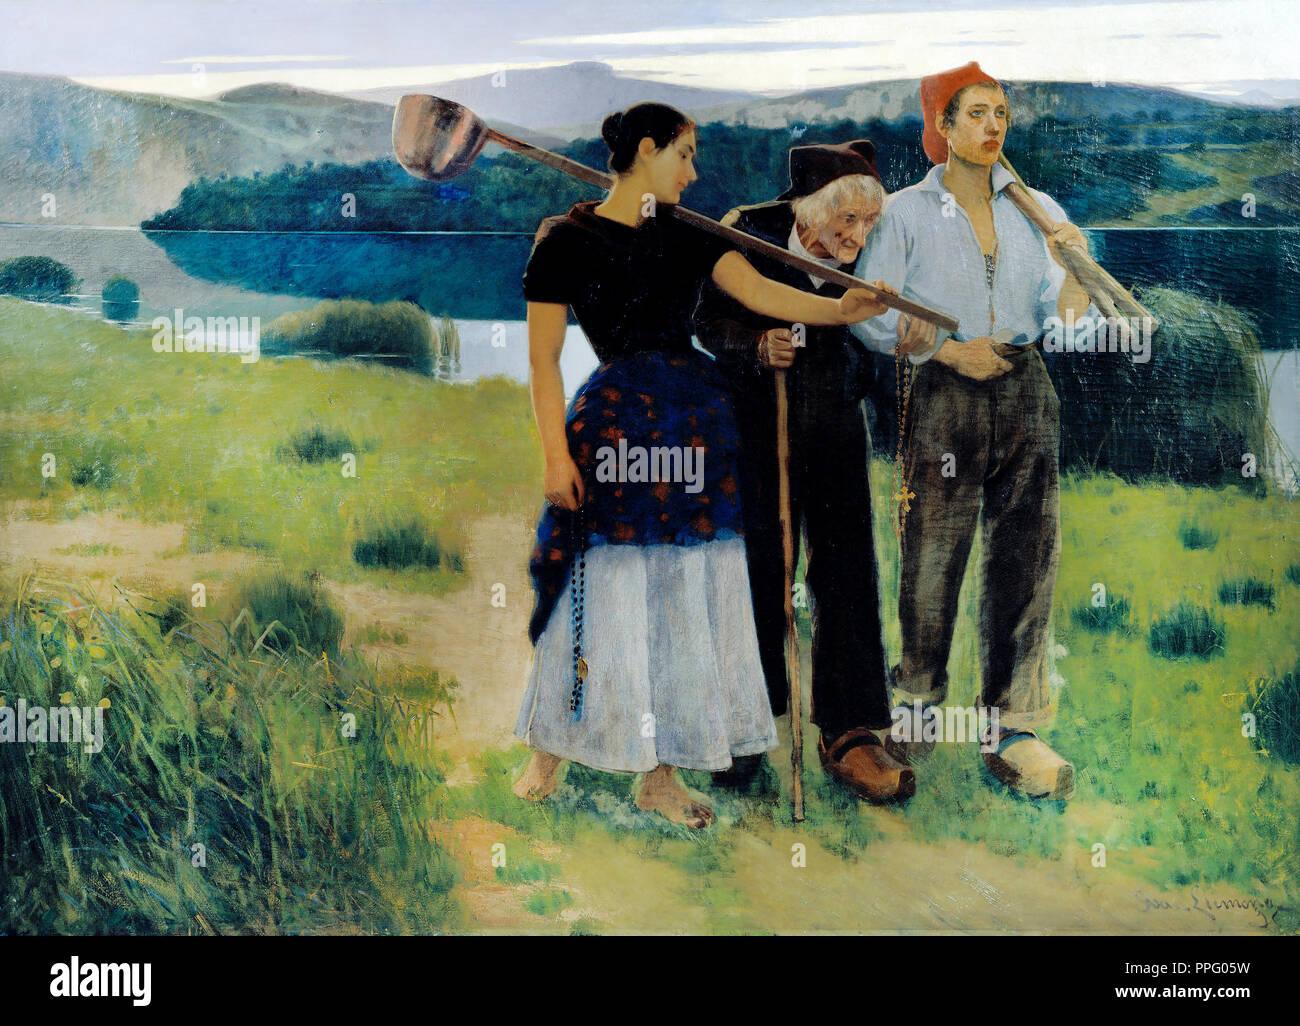 Joan Llimona, Returning from the Plot 1896 Oil on canvas. Museu Nacional d'Art de Catalunya, Barcelona, Spain. - Stock Image